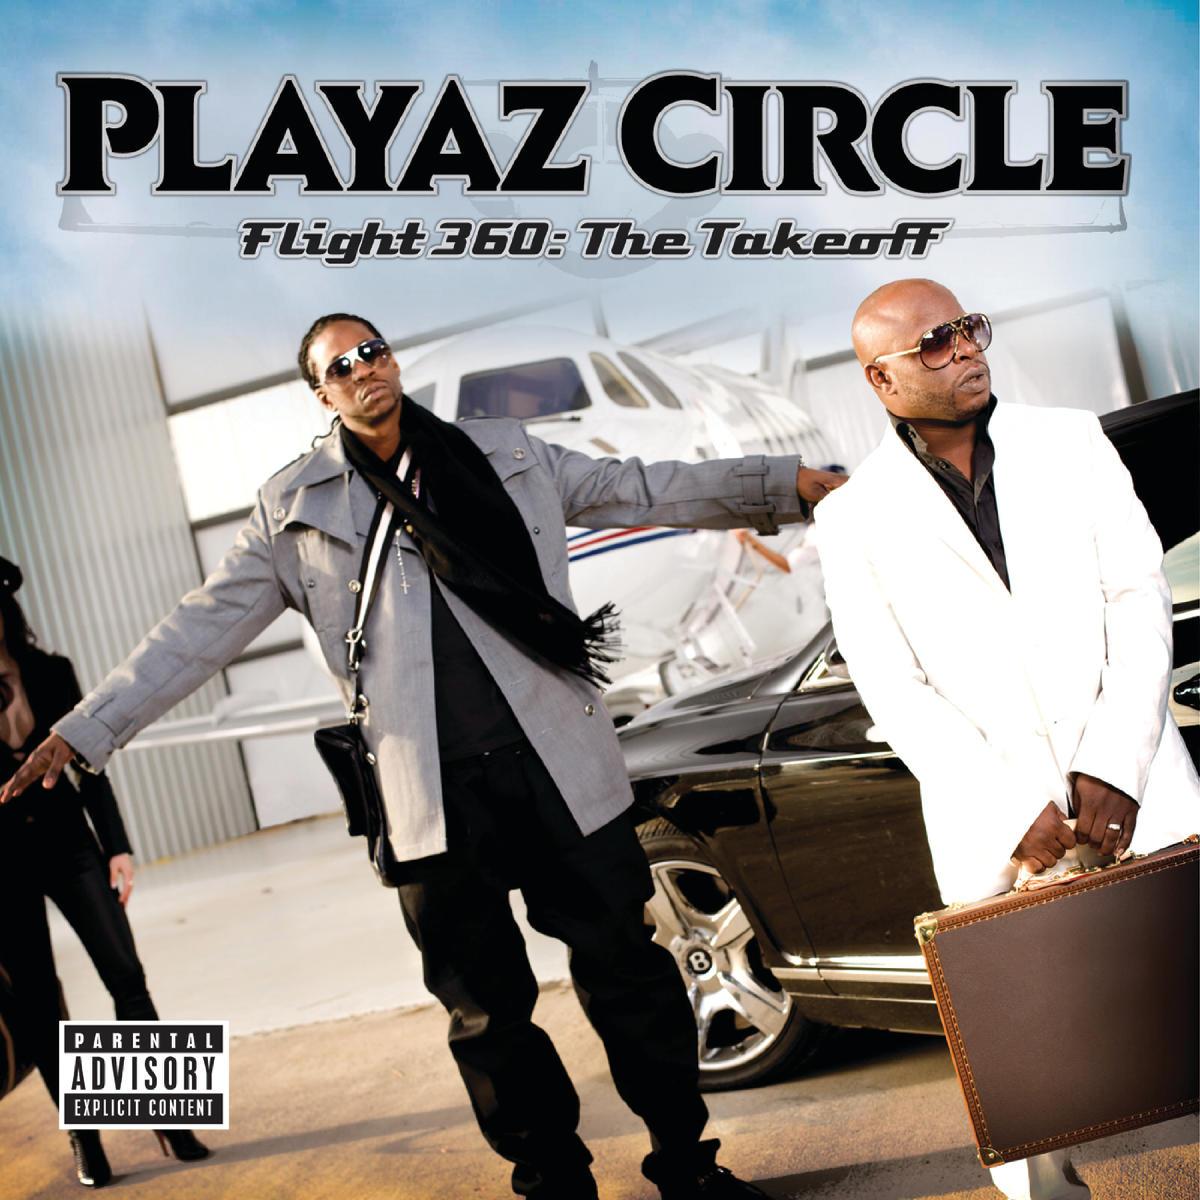 Soundhound big dawg playaz circle lil wayne jpg 1200x1200 Playaz circle lil  wayne 1a561bf3975e9